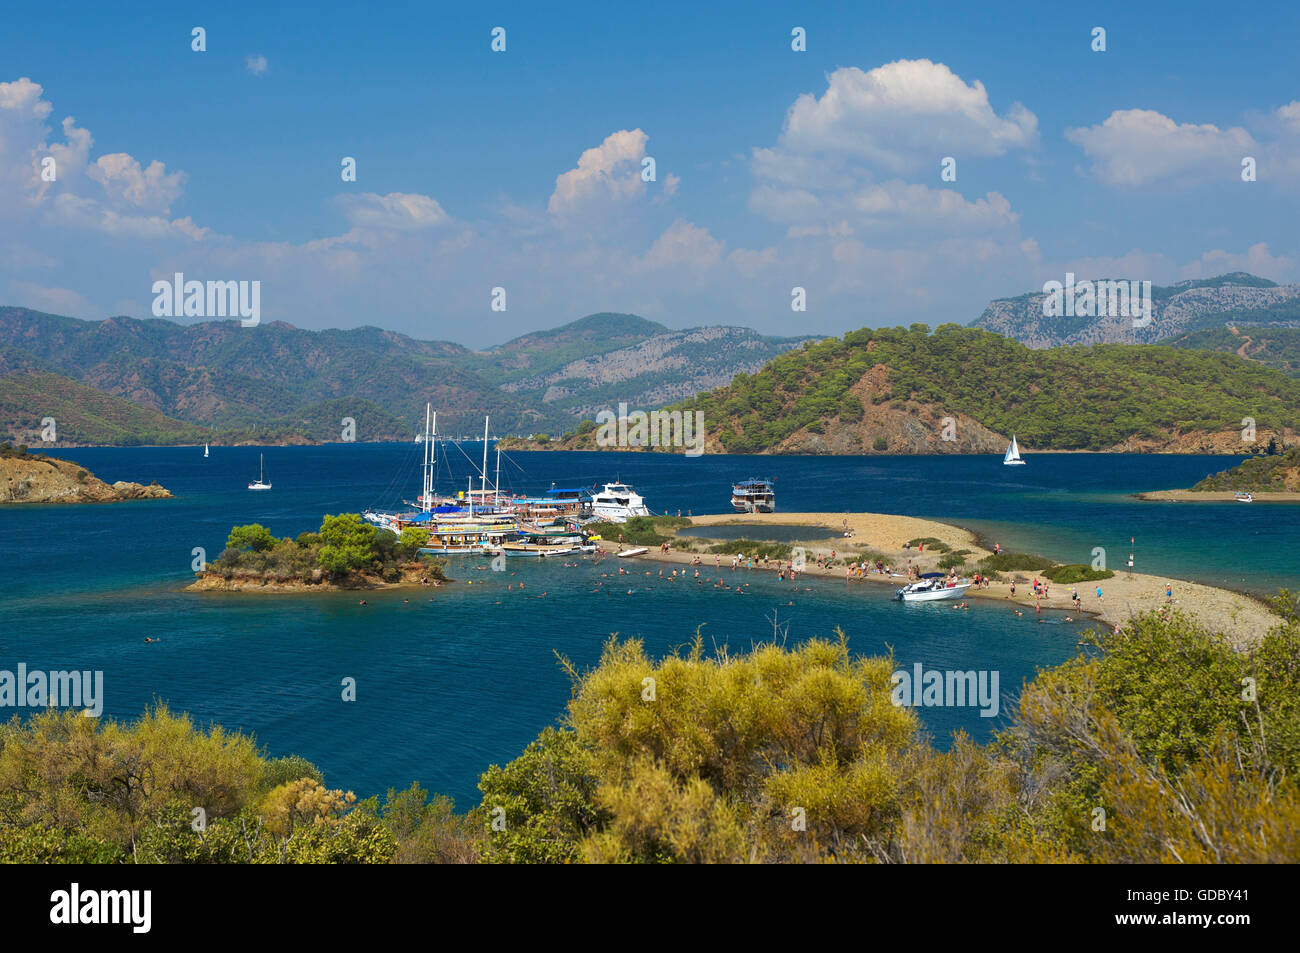 Adlar calis beach island, adlar, 12 island tour , fethiye,turkish